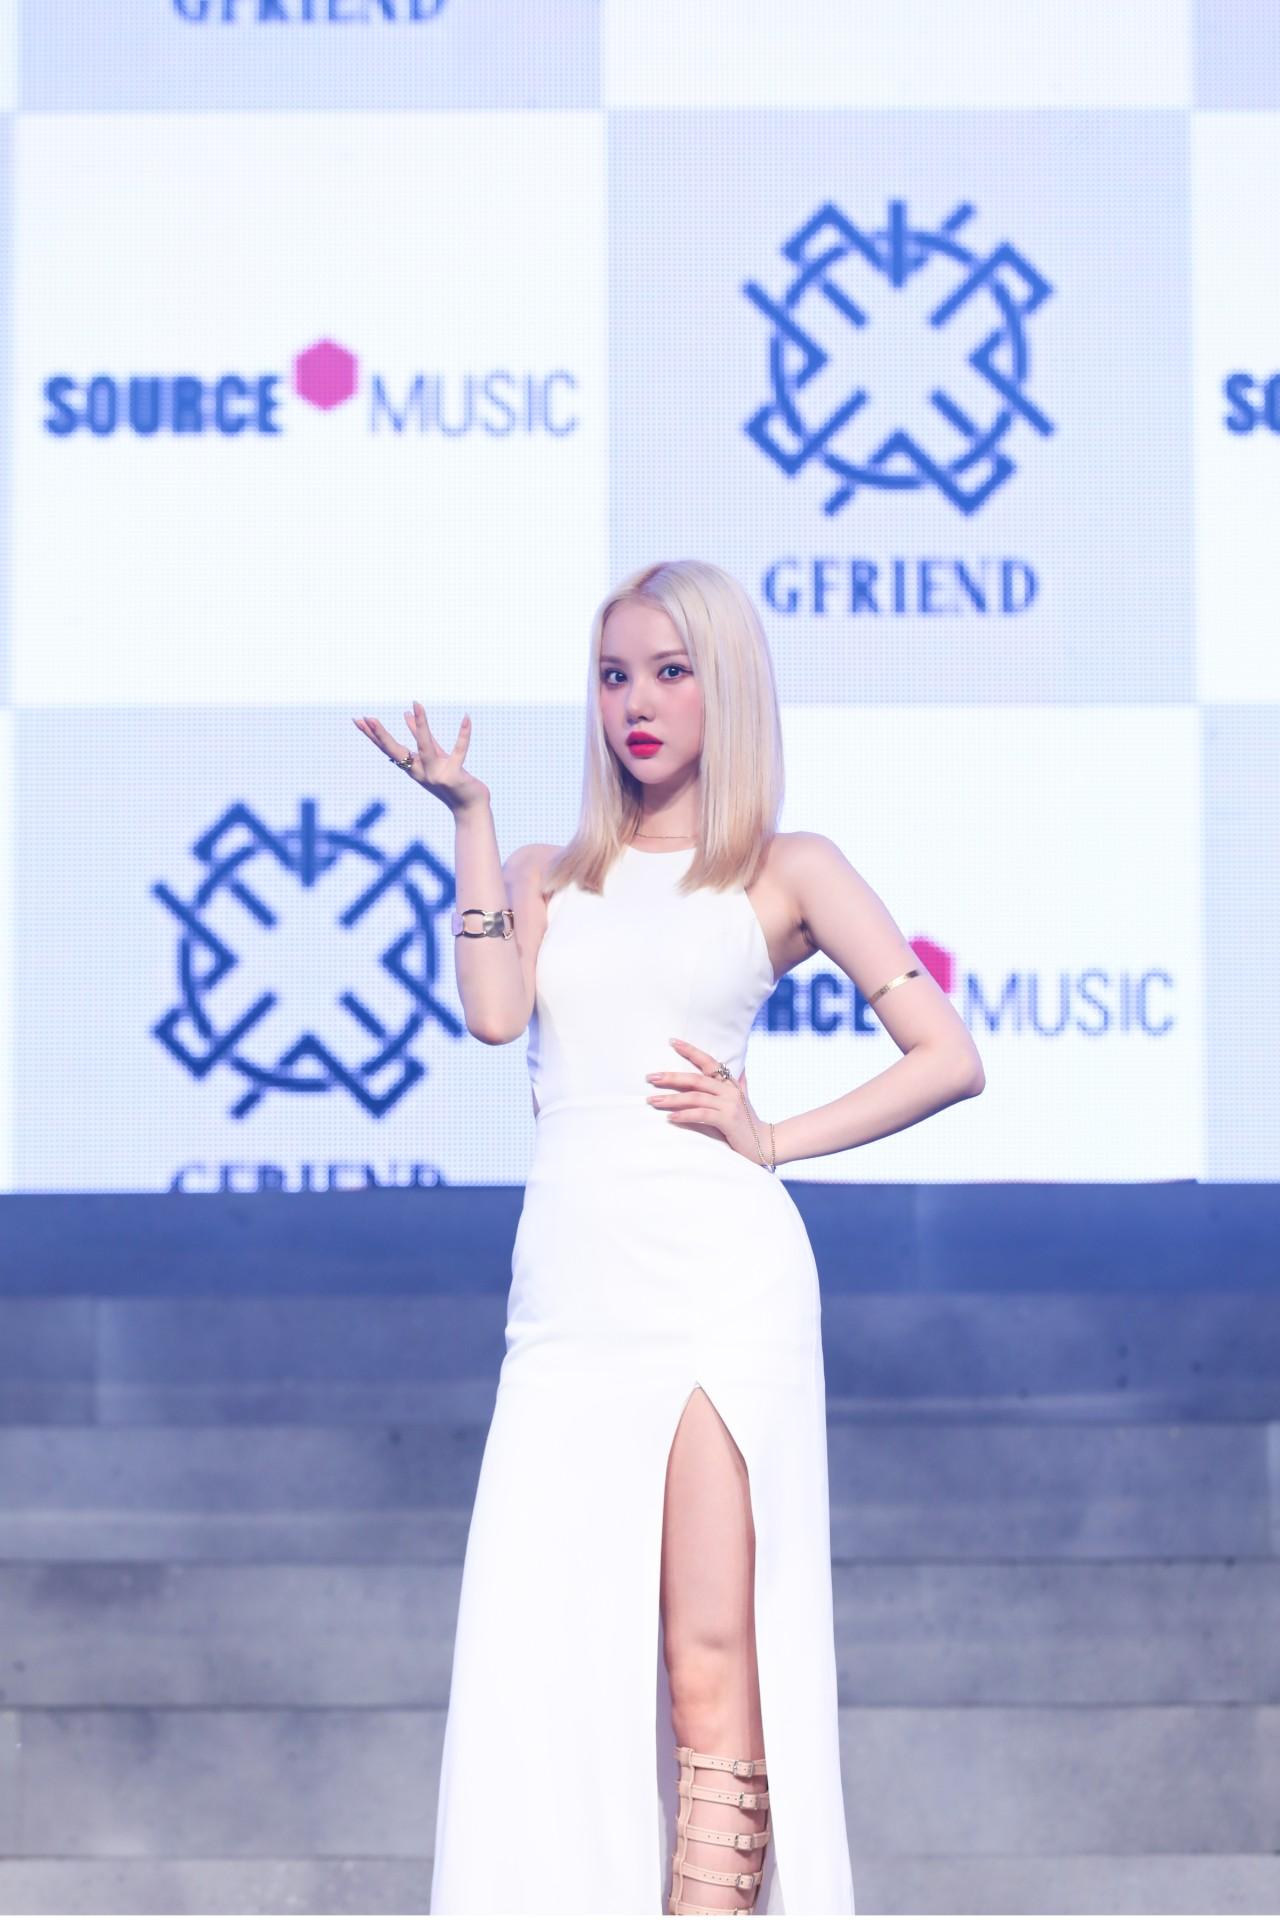 Member Eunha of GFRIEND (Photo Credit=Source Music)